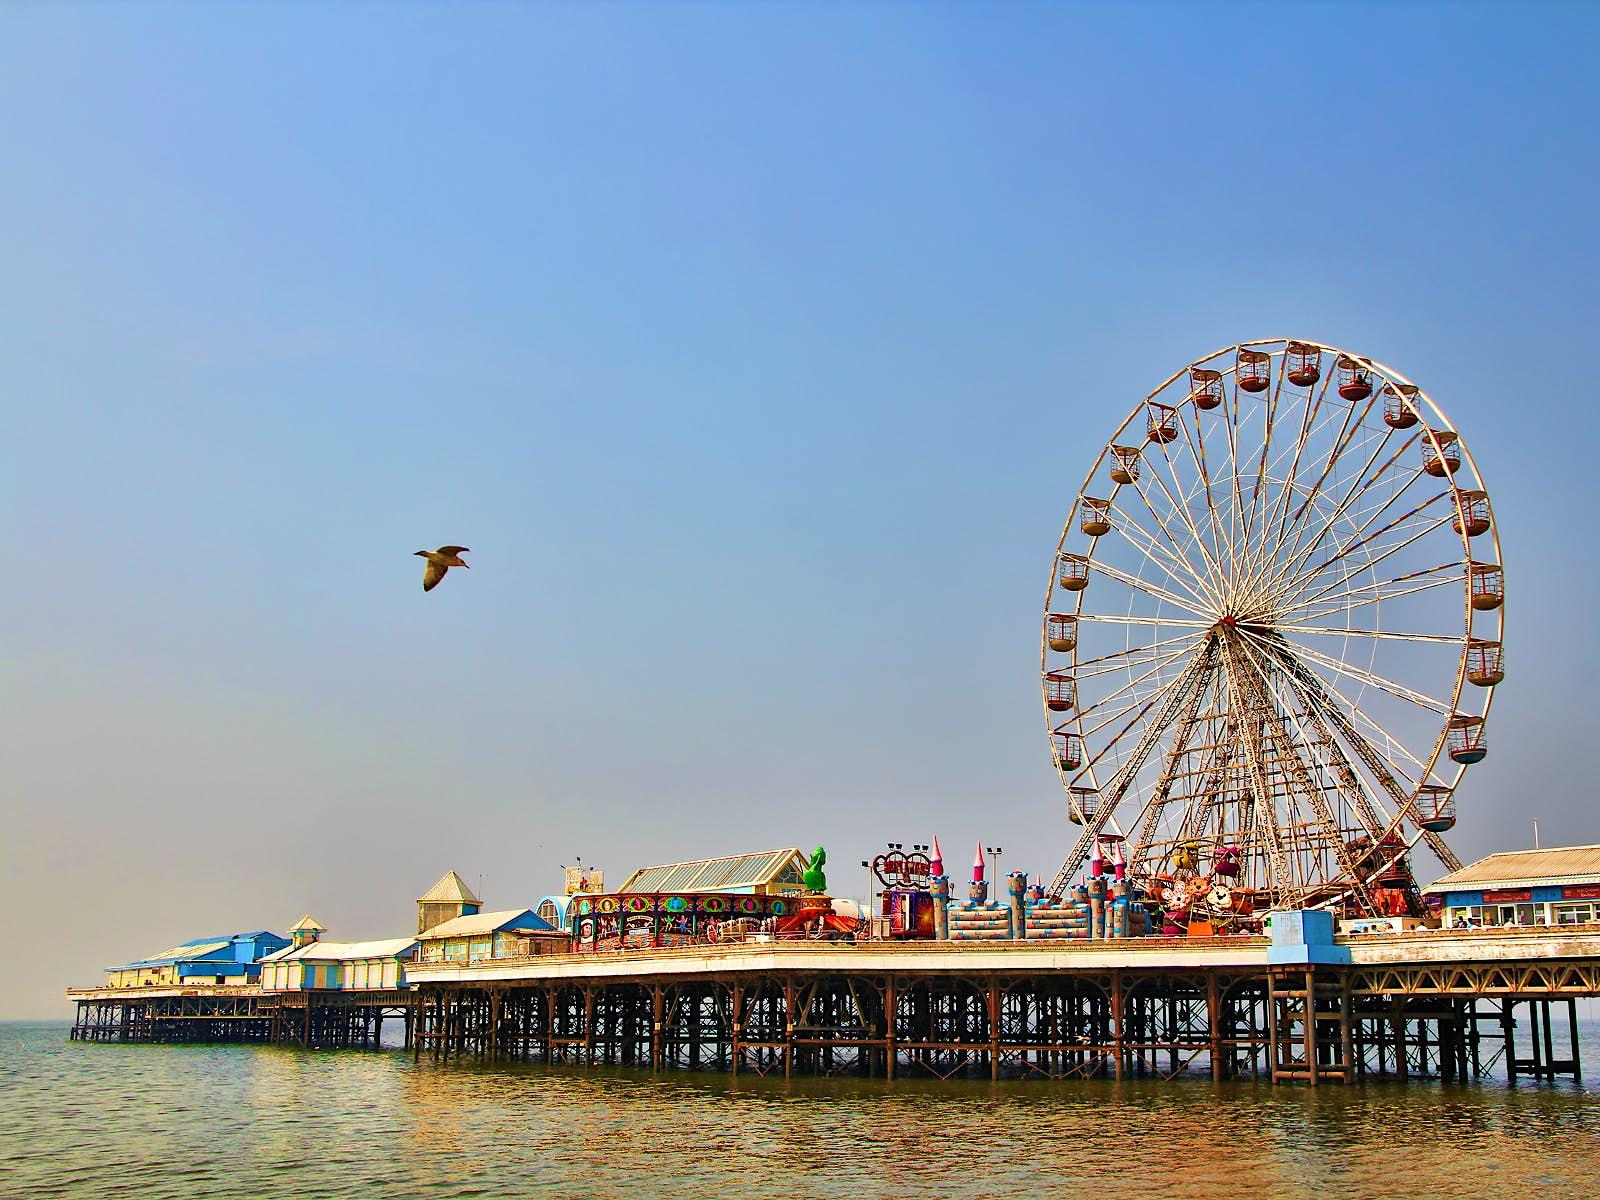 Disney alternatives - Blackpool Pleasure Beach pier. The huge ferris wheel sticks up into a clear blue sky as a seagull flies by.